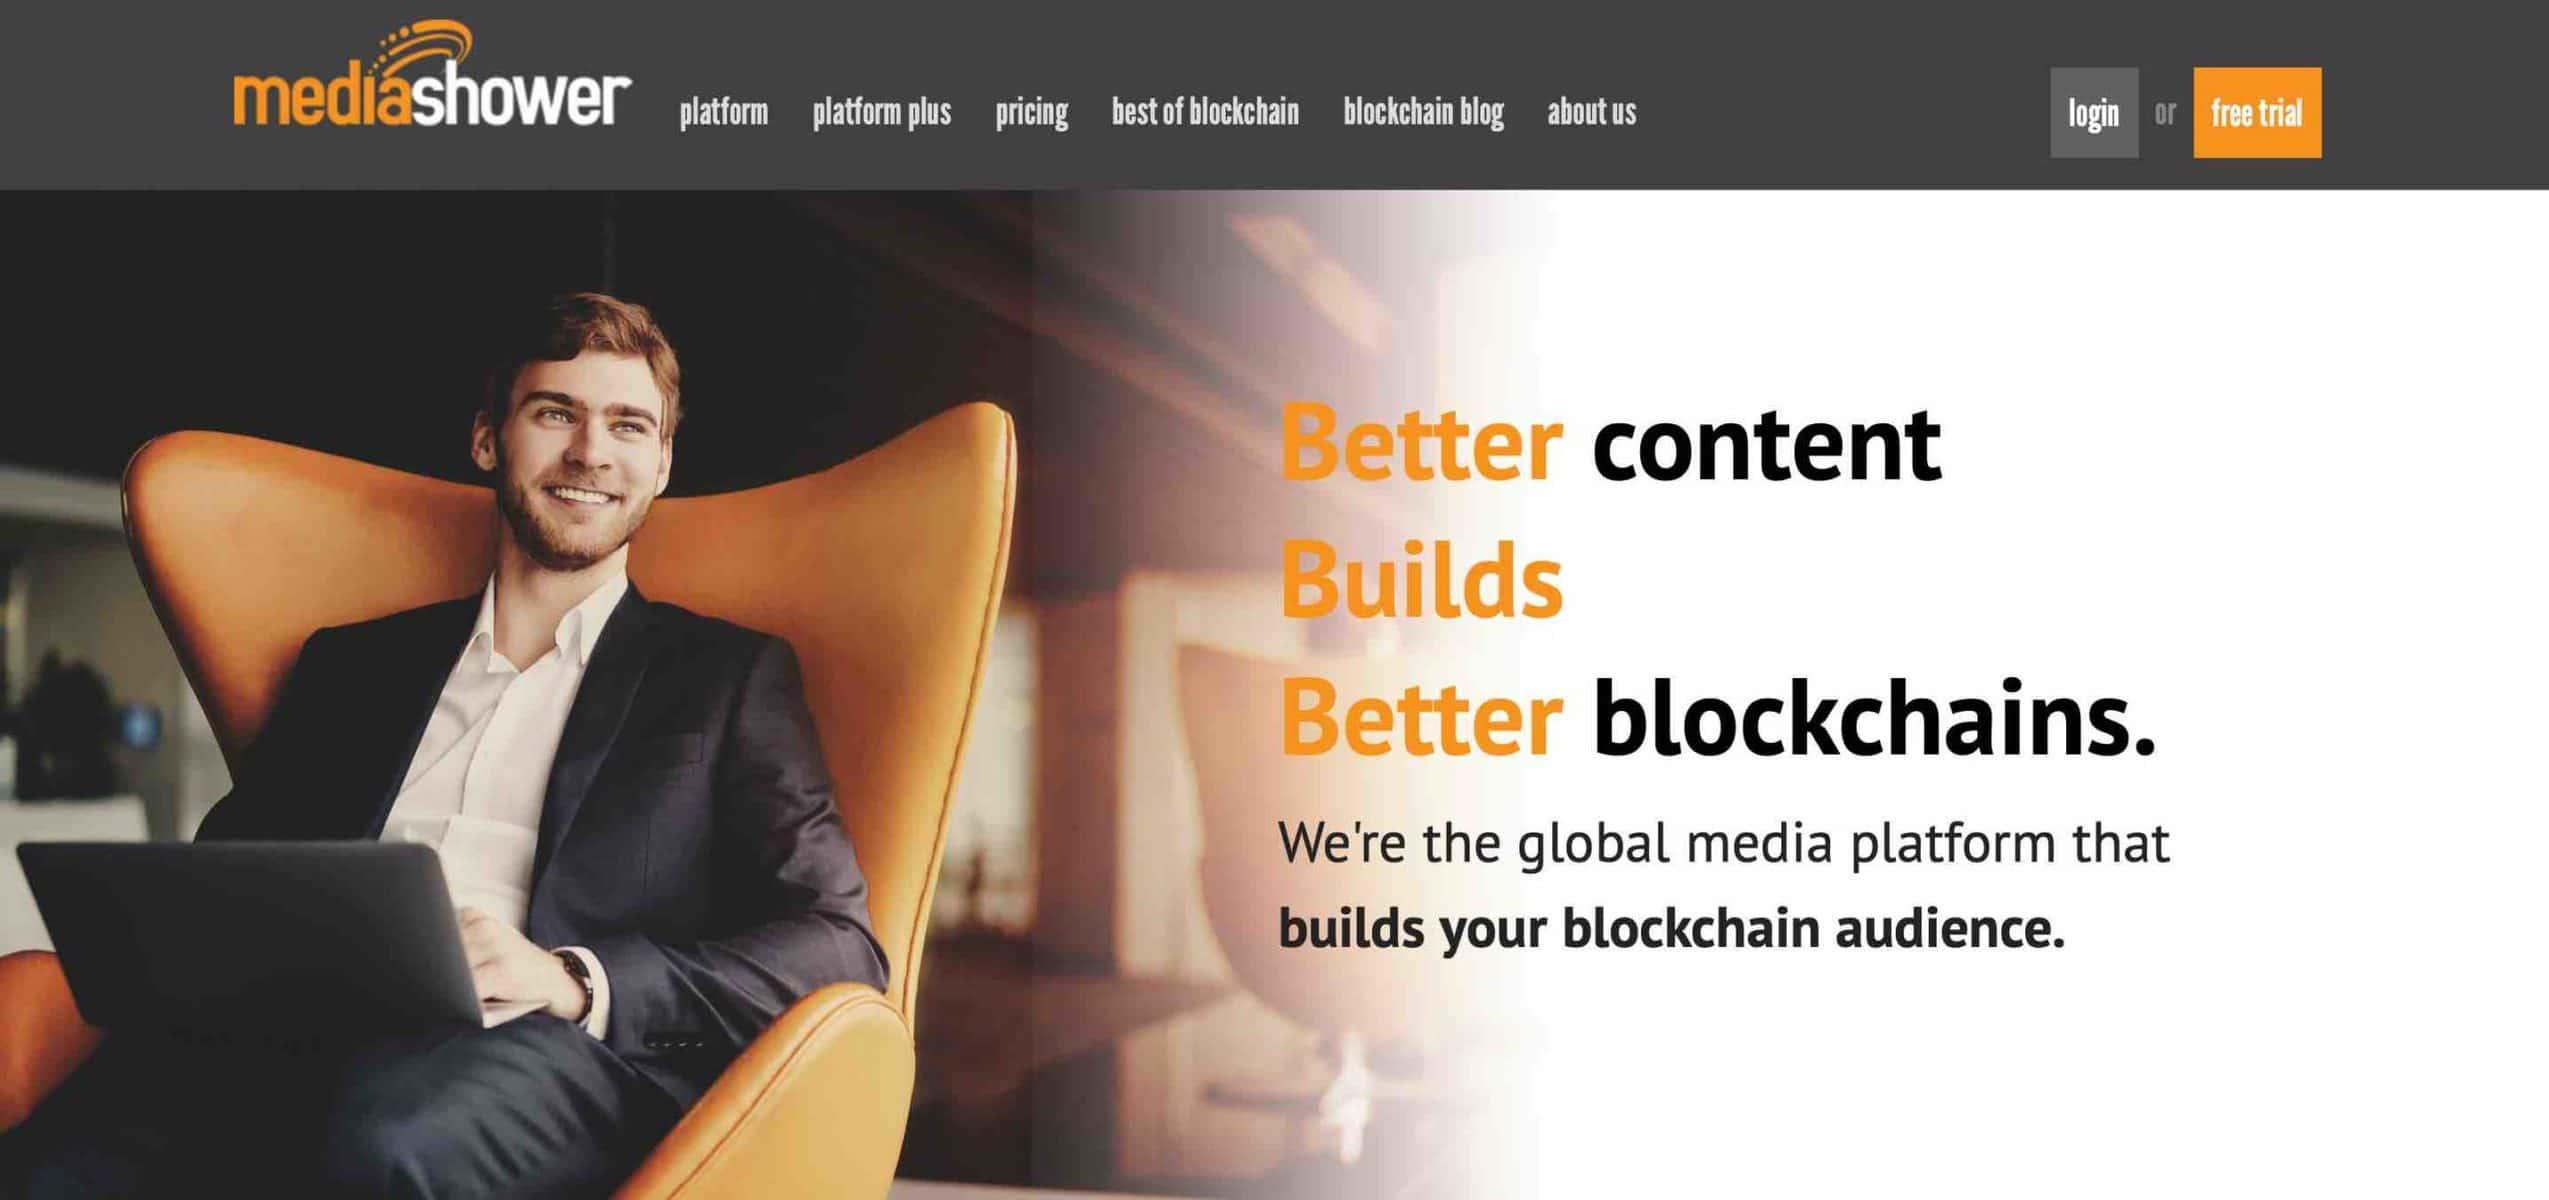 Better content Builds Better blockchains